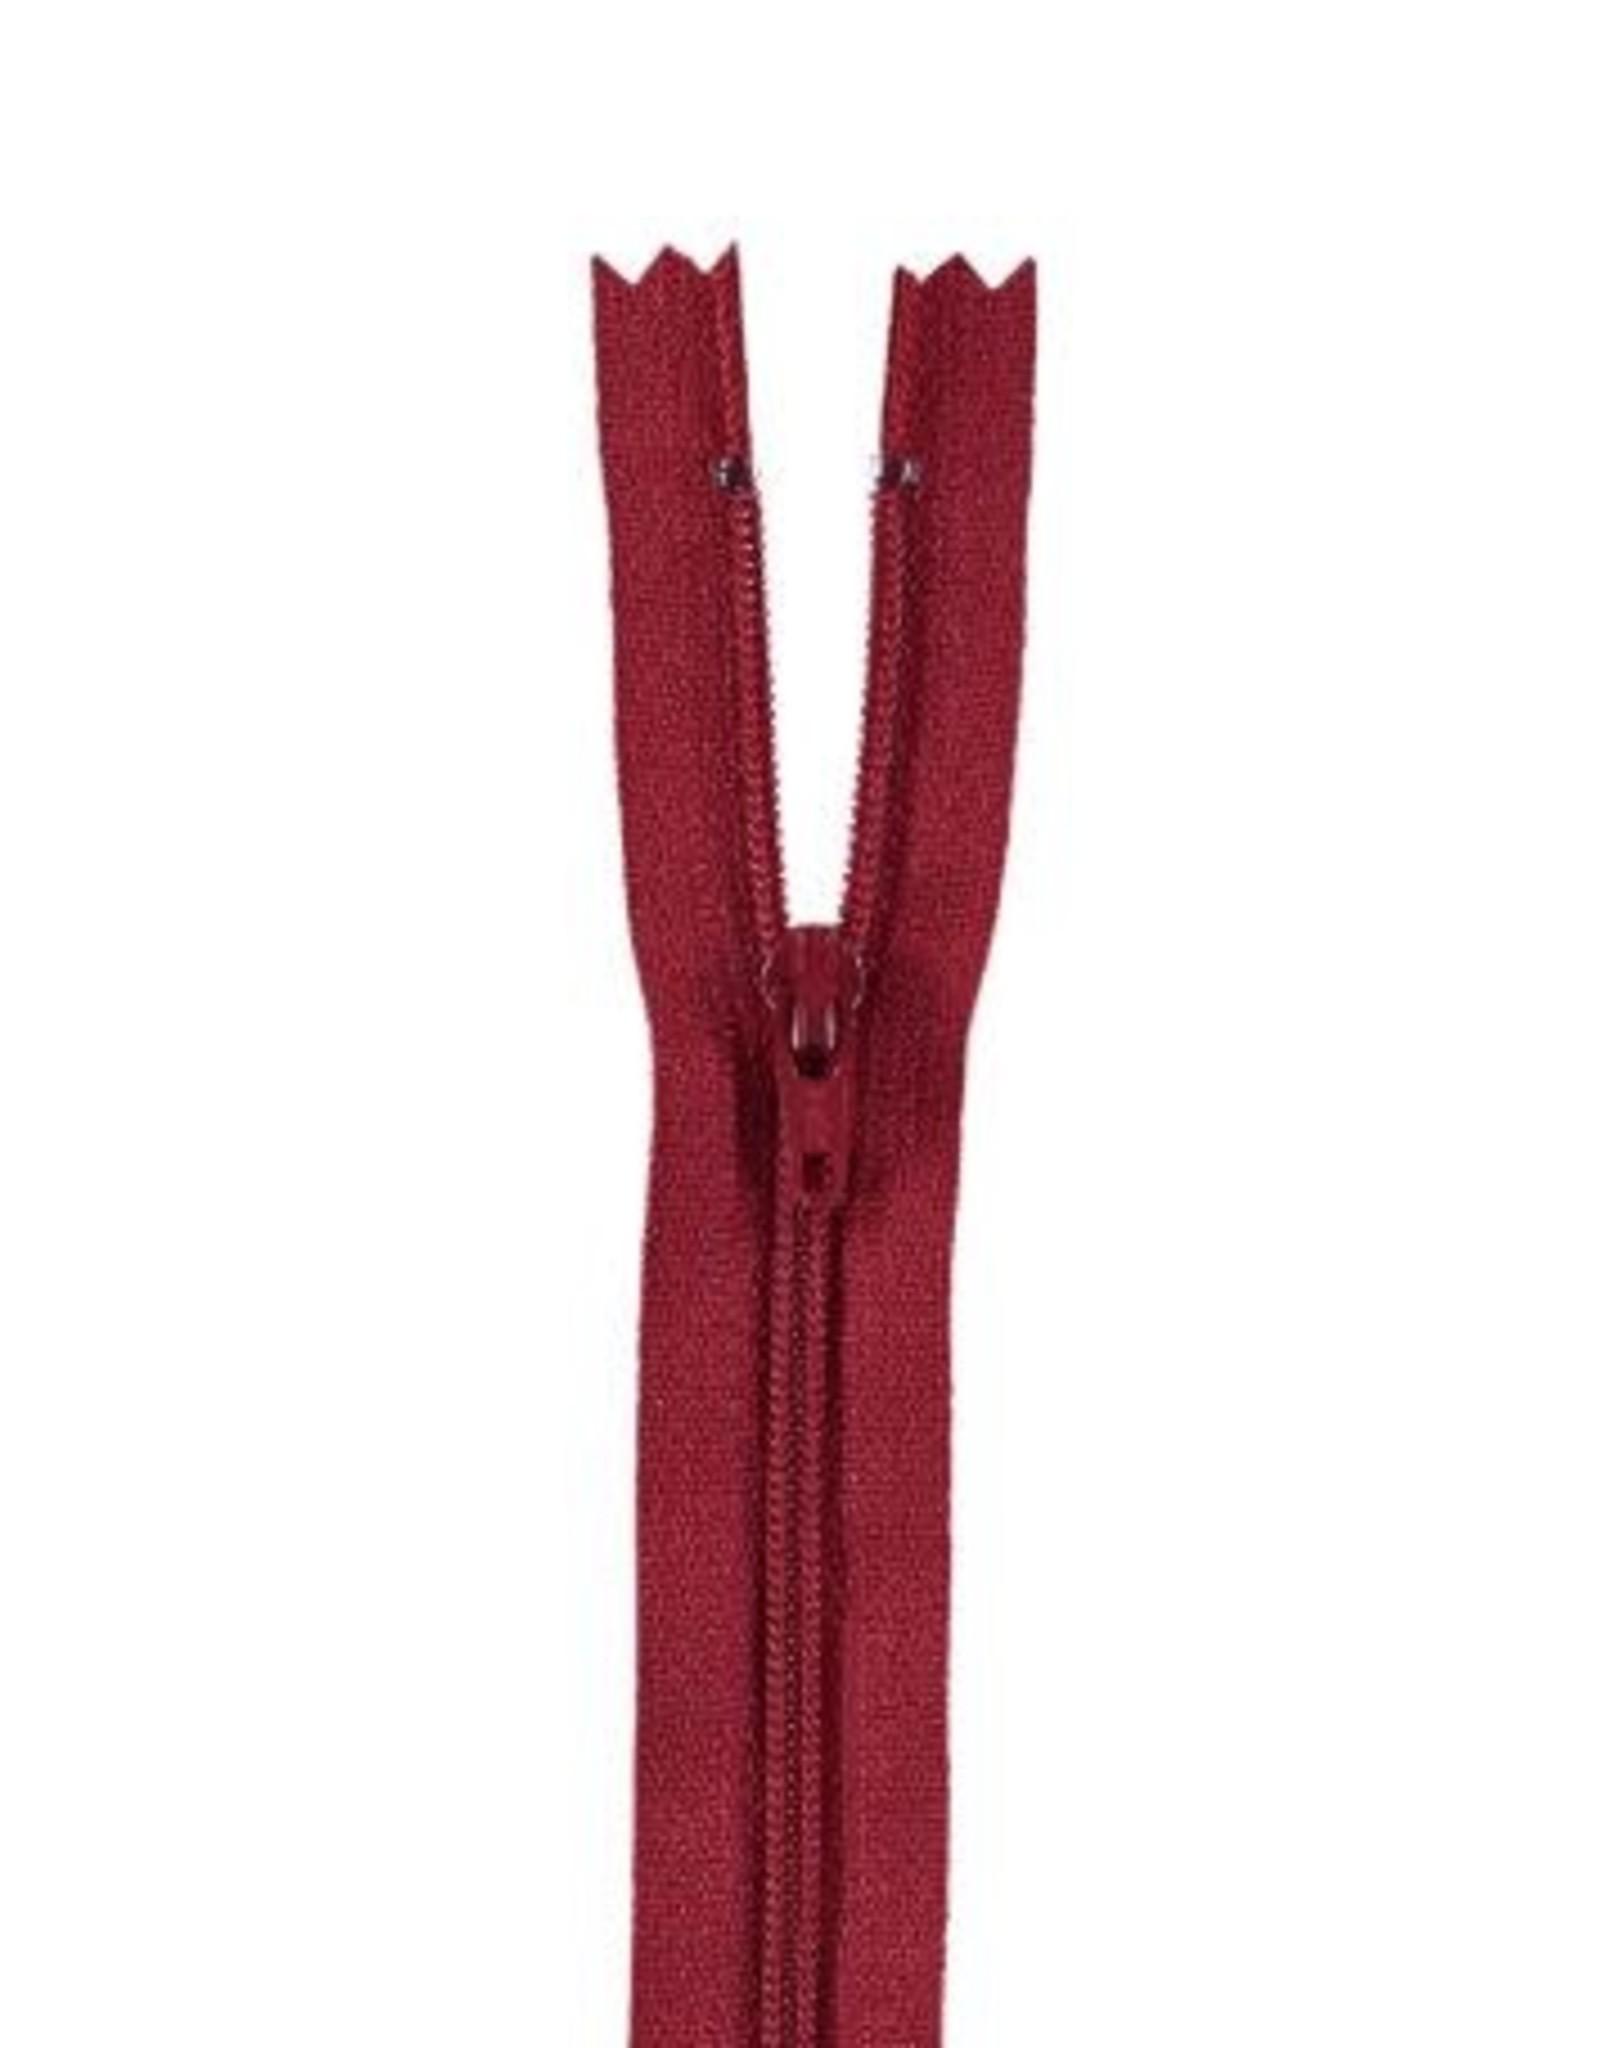 YKK Spiraalrits niet-DB 3mm donker rood 520-35cm